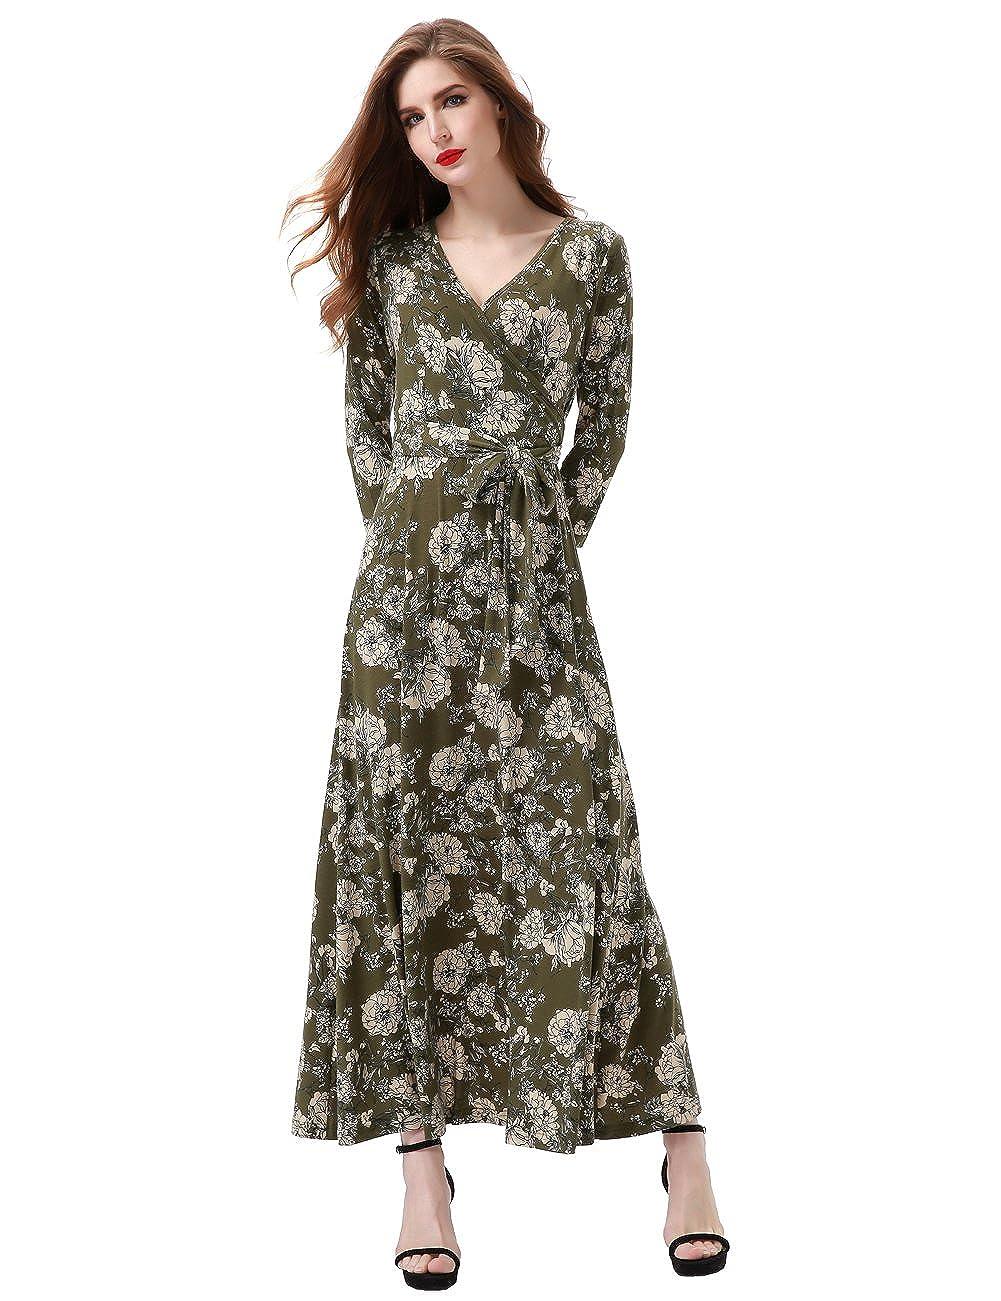 70s Dresses – Disco Dress, Hippie Dress, Wrap Dress Aphratti Womens 3/4 Sleeve Vintage Faux Wrap Long Maxi Dress with Belt $27.99 AT vintagedancer.com